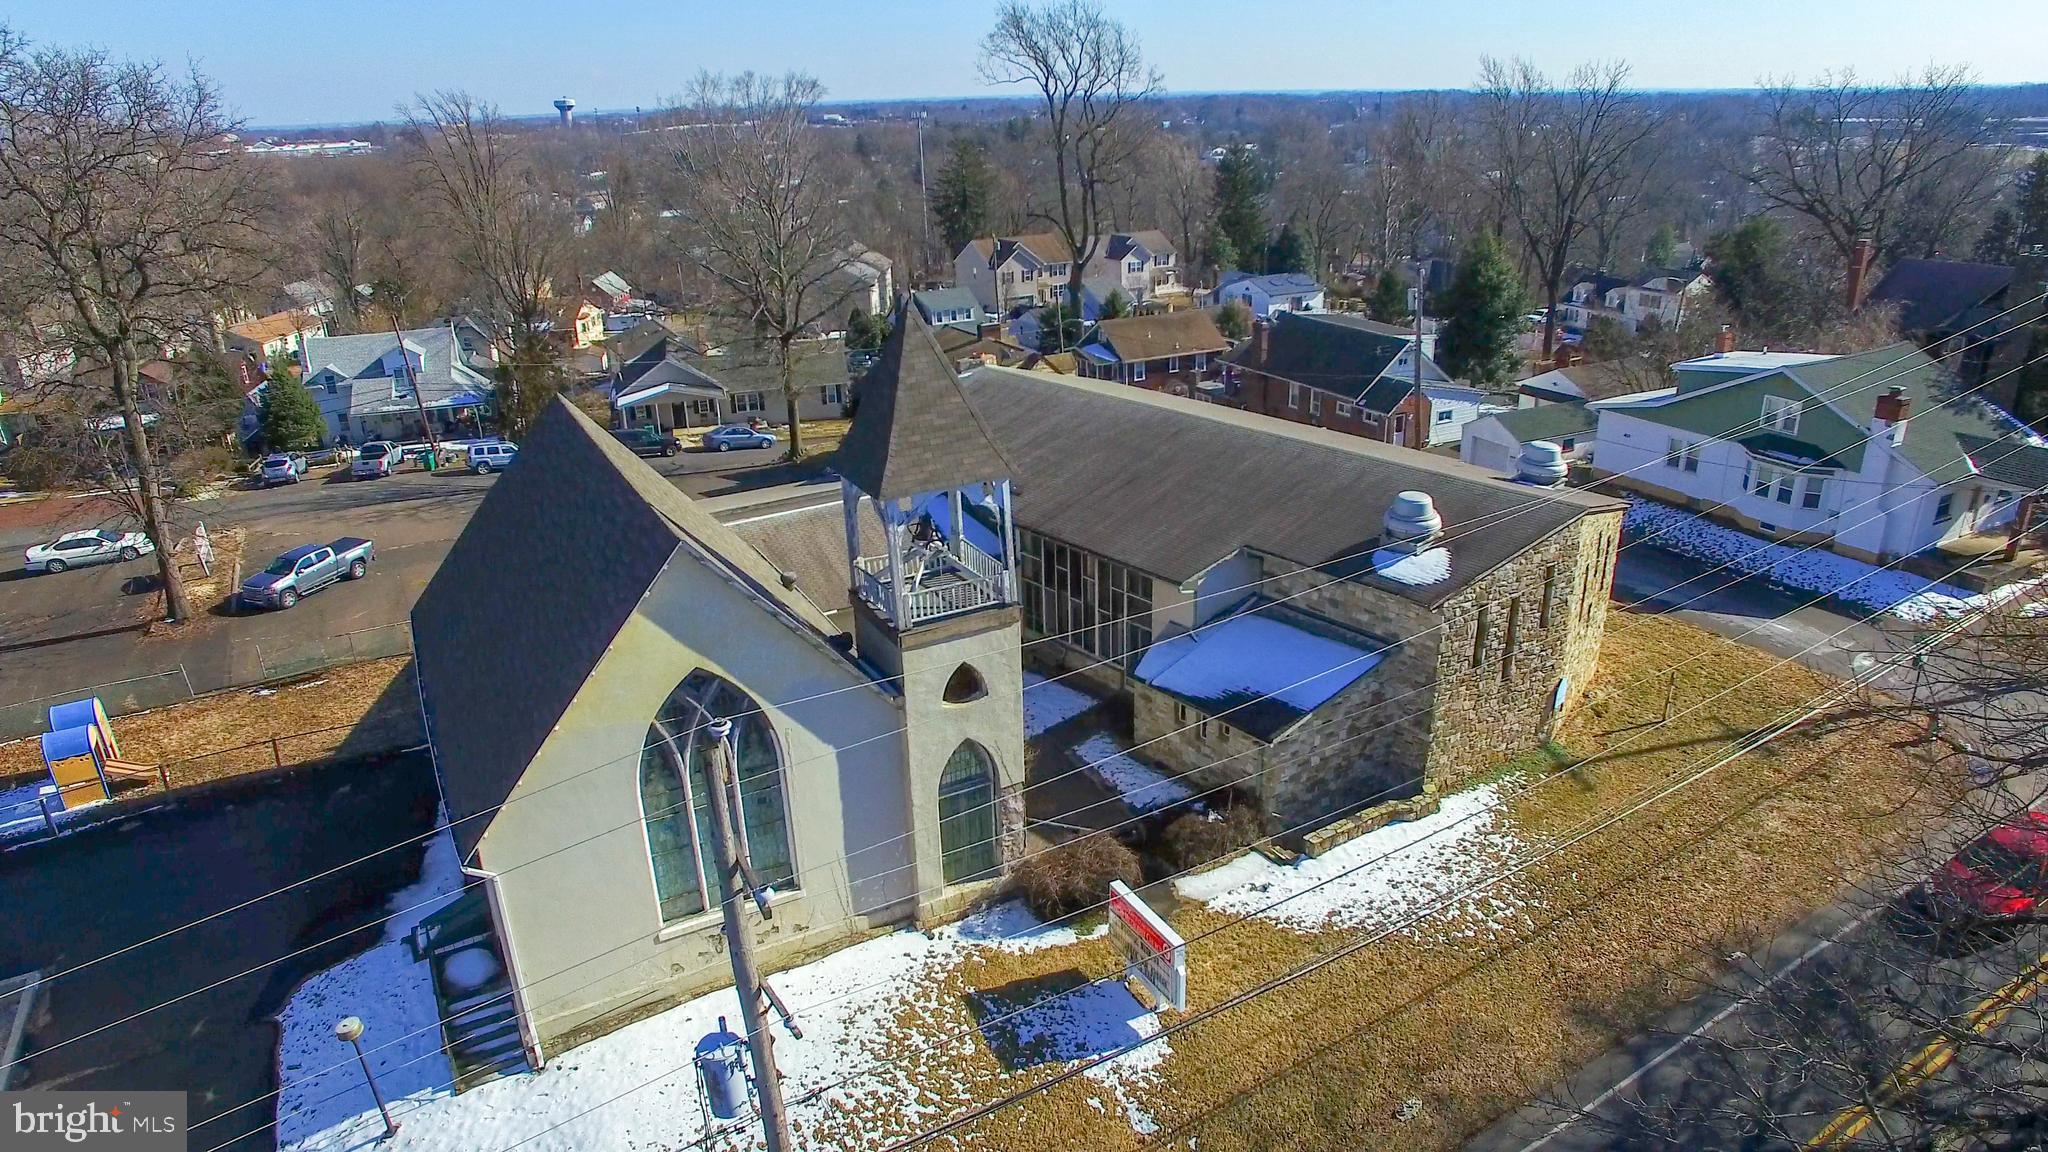 4937 CHURCH AVENUE, FEASTERVILLE TREVOSE, PA 19053